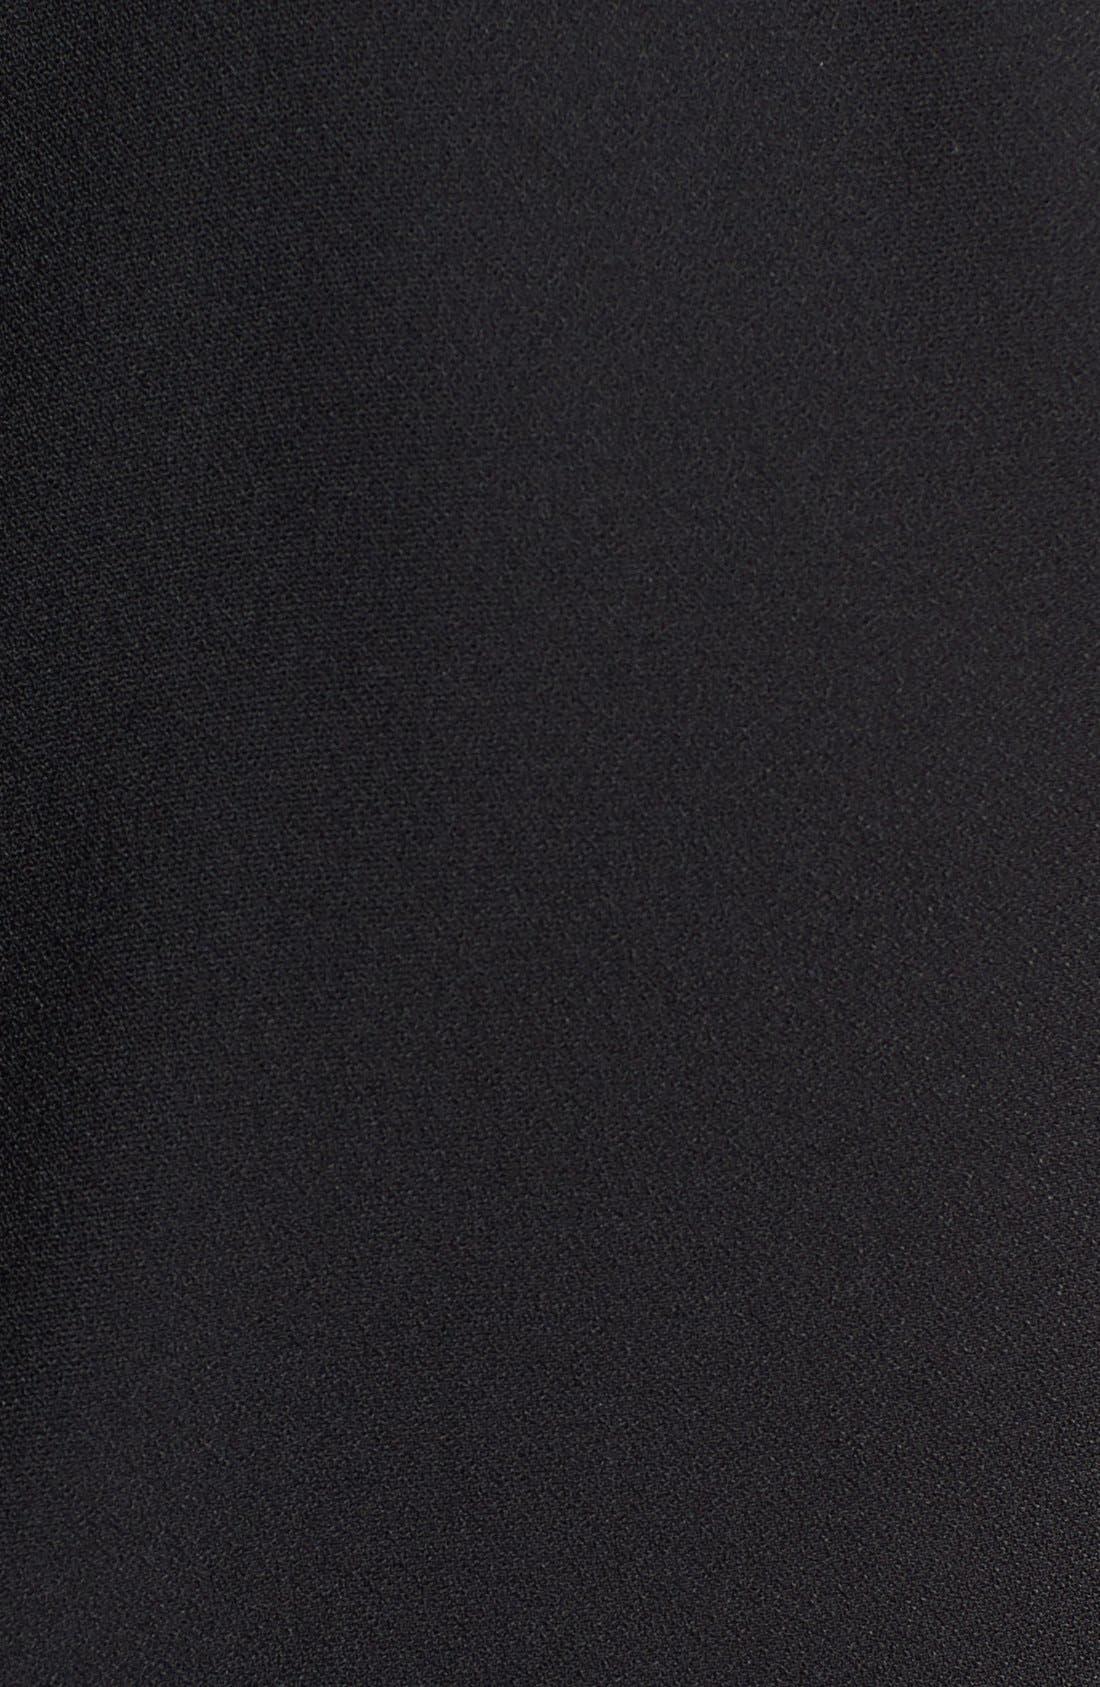 Alternate Image 3  - Vince Camuto Organza Trim Sheath Dress